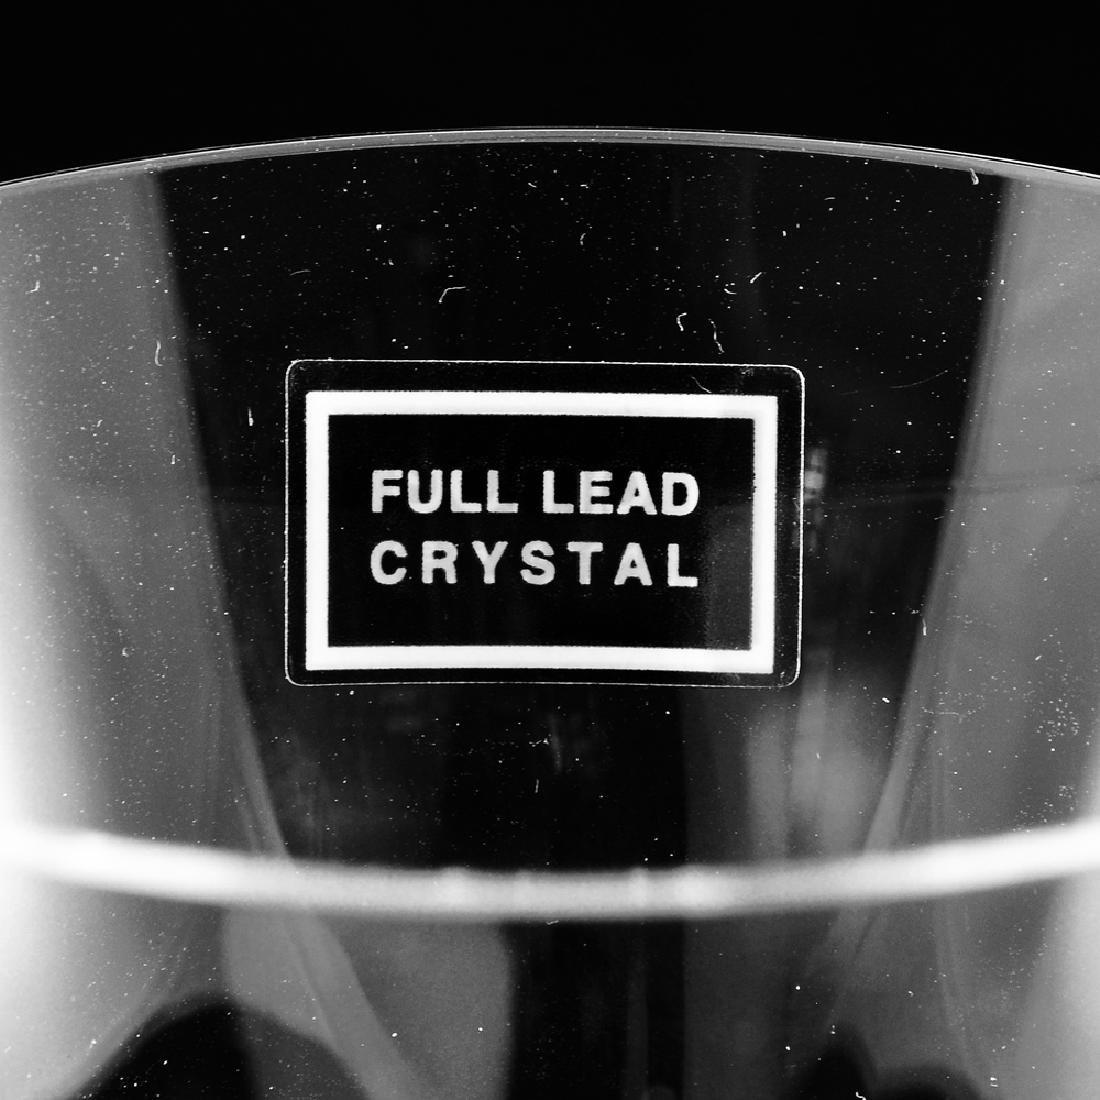 6 Zeisel Nambe Crystal Goblets, 3 sizes (2008) - 6